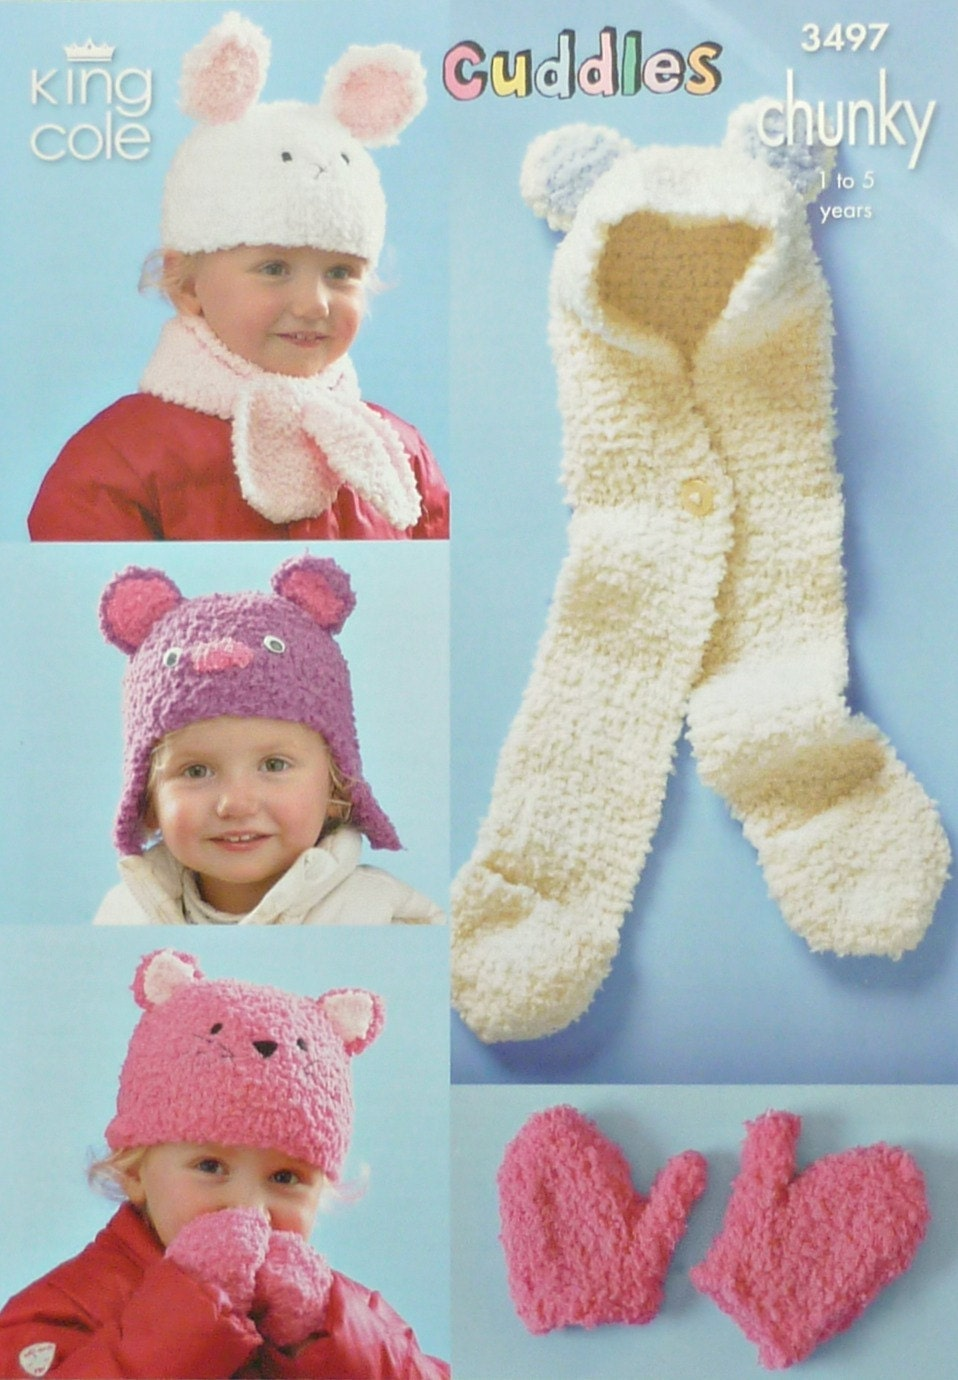 Knitting Patterns Childrens Hats Mittens : Childrens Hat Knitting Pattern K3497 Childrens Assorted Hats, Mittens & S...